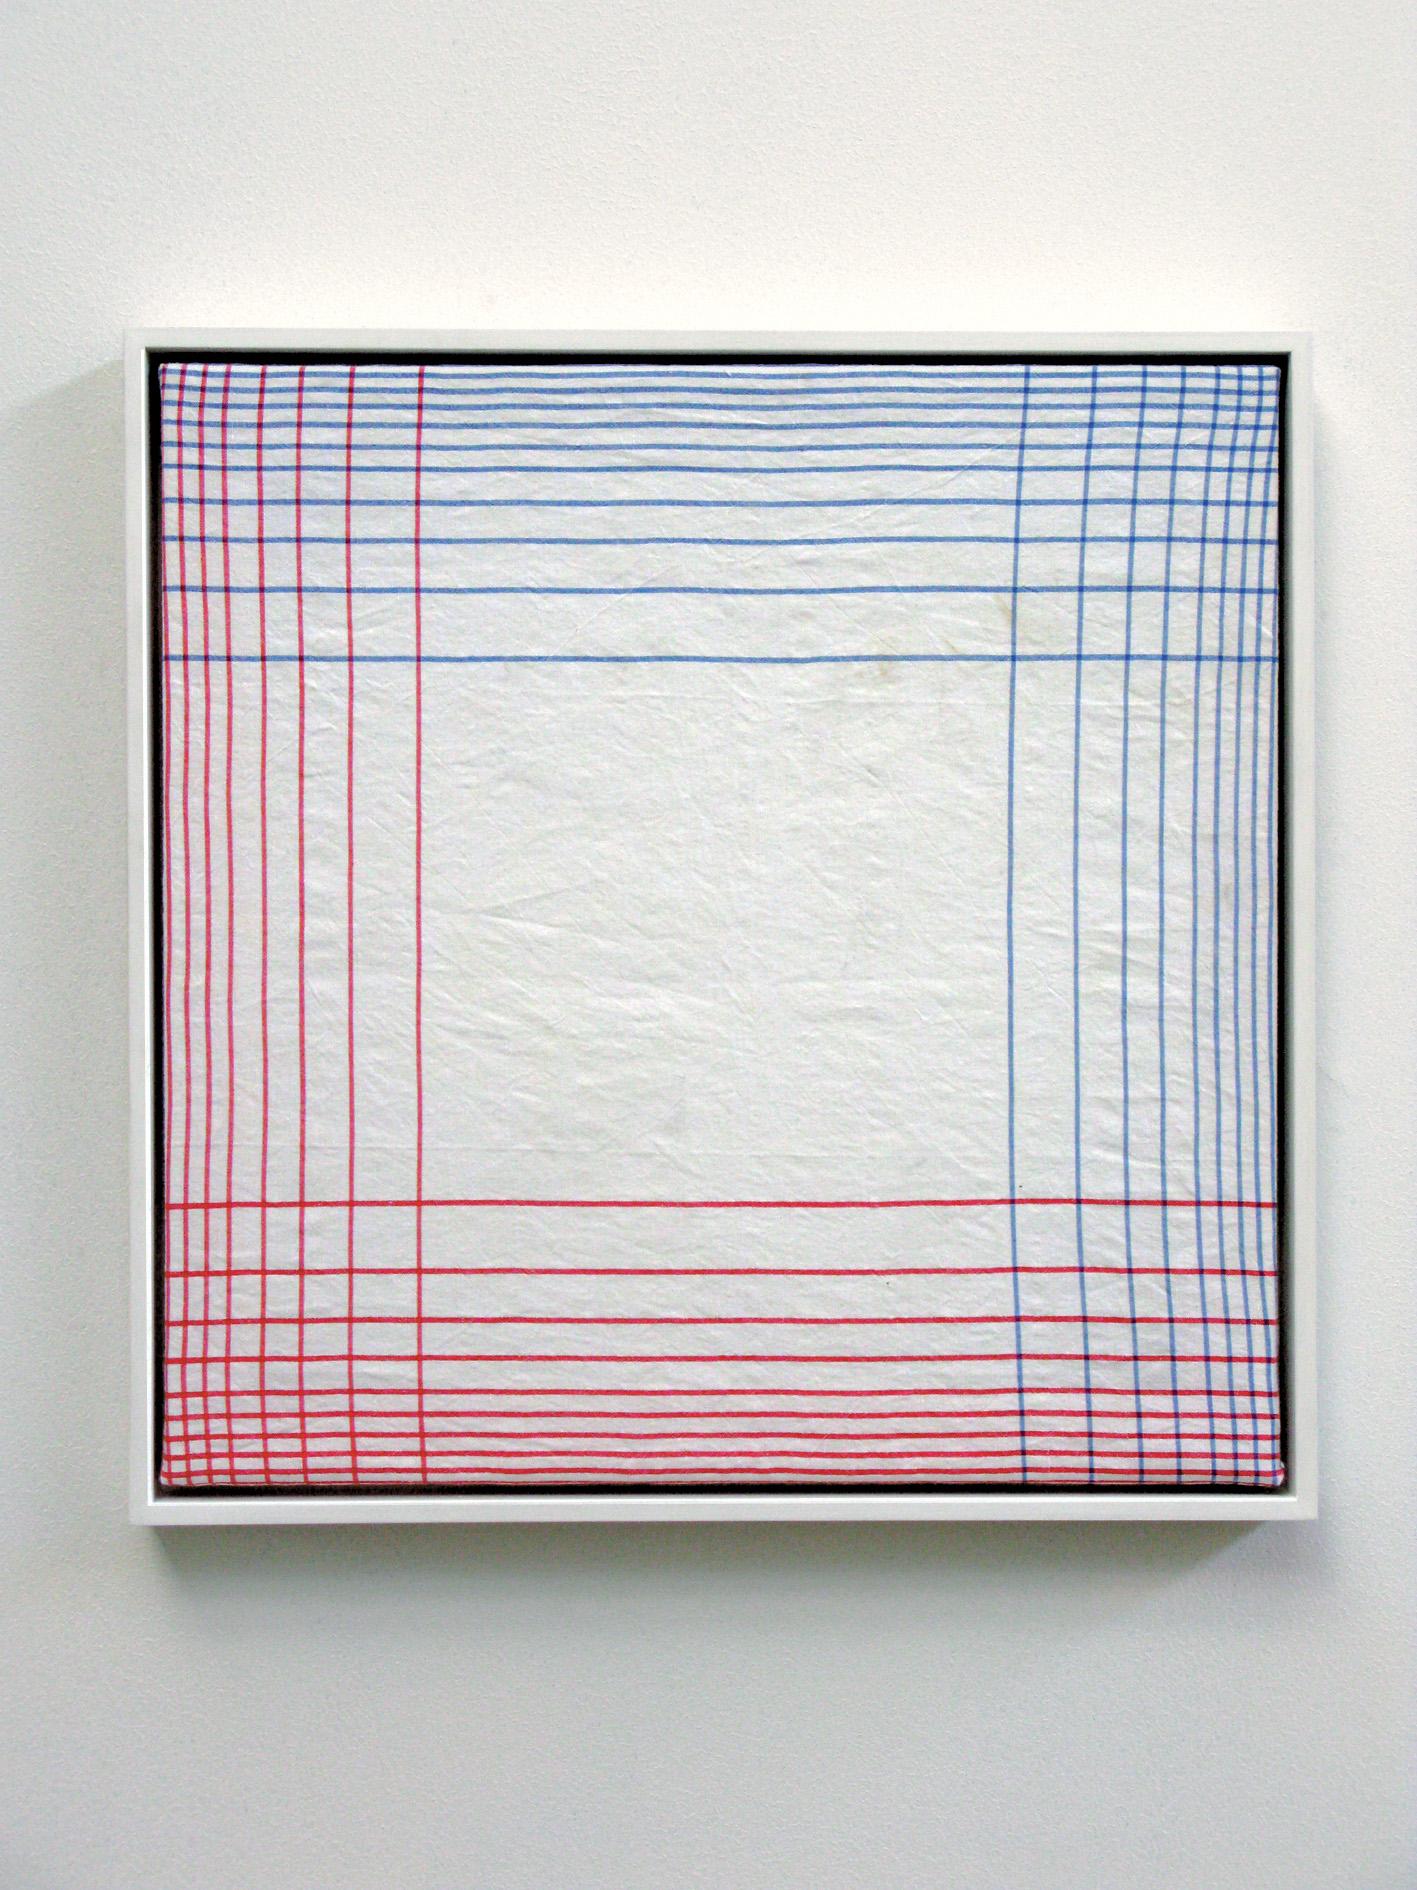 Mike Meiré, Bauhaus, 2008. Photo: Courtesy: Bartha Contemporary, London.